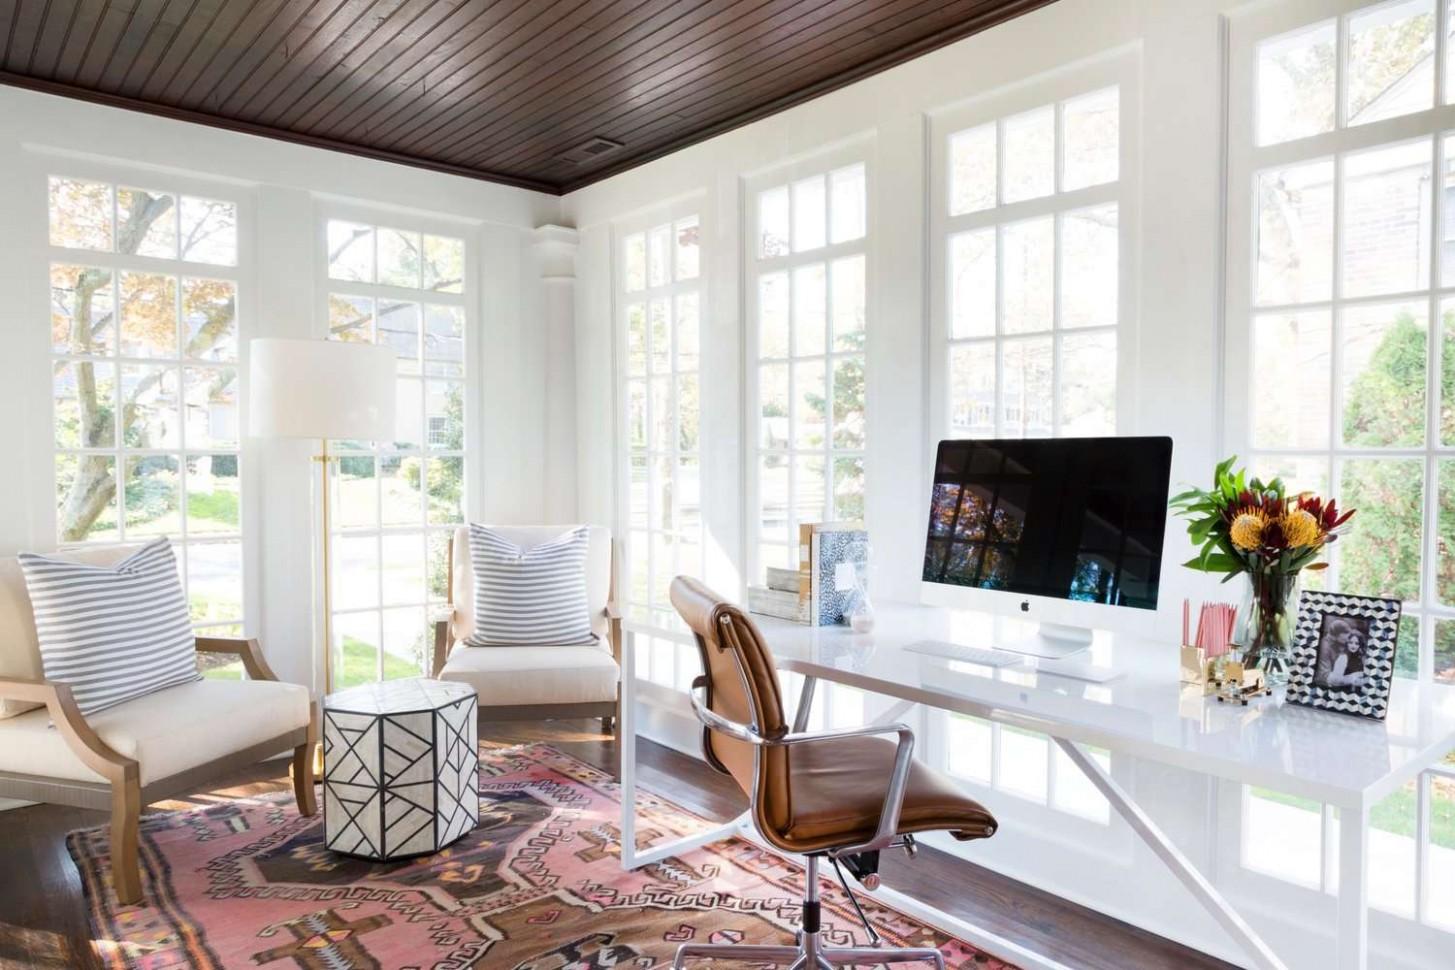 9 Sunroom Decor Ideas to Brighten Your Space - Sunroom Ideas For Office